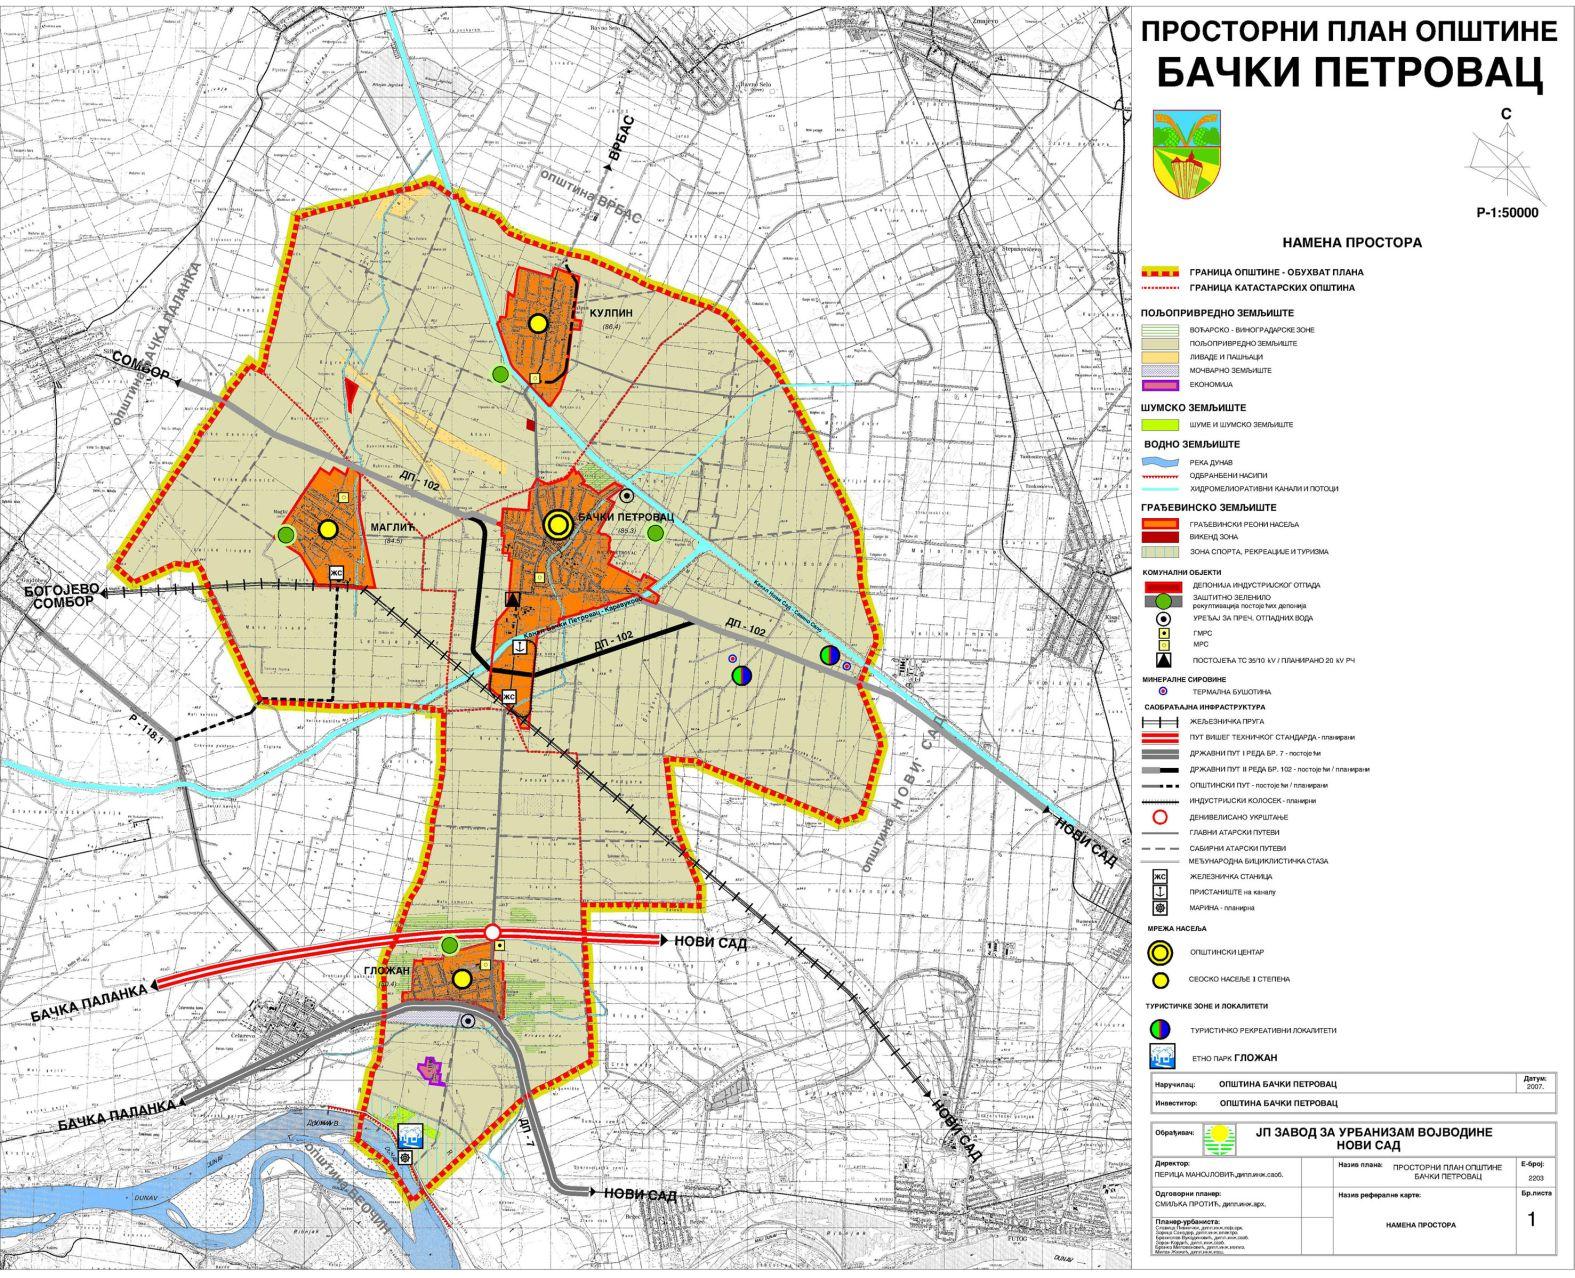 beograd backi petrovac mapa JP Zavod za urbanizam Vojvodine   Prostorni planovi beograd backi petrovac mapa